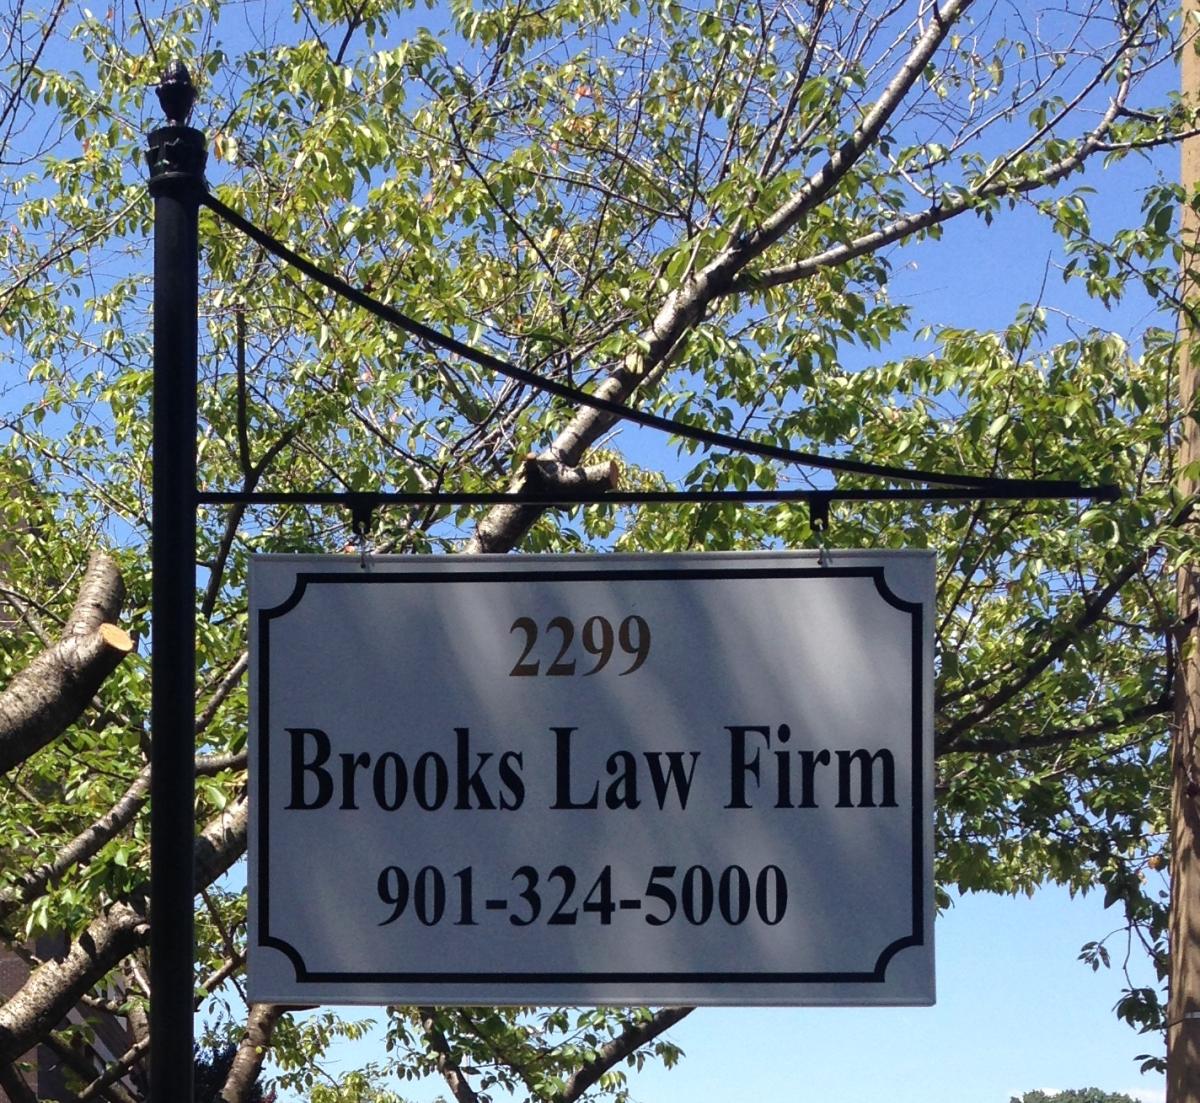 PATRICK BROOKS LAW FIRM,